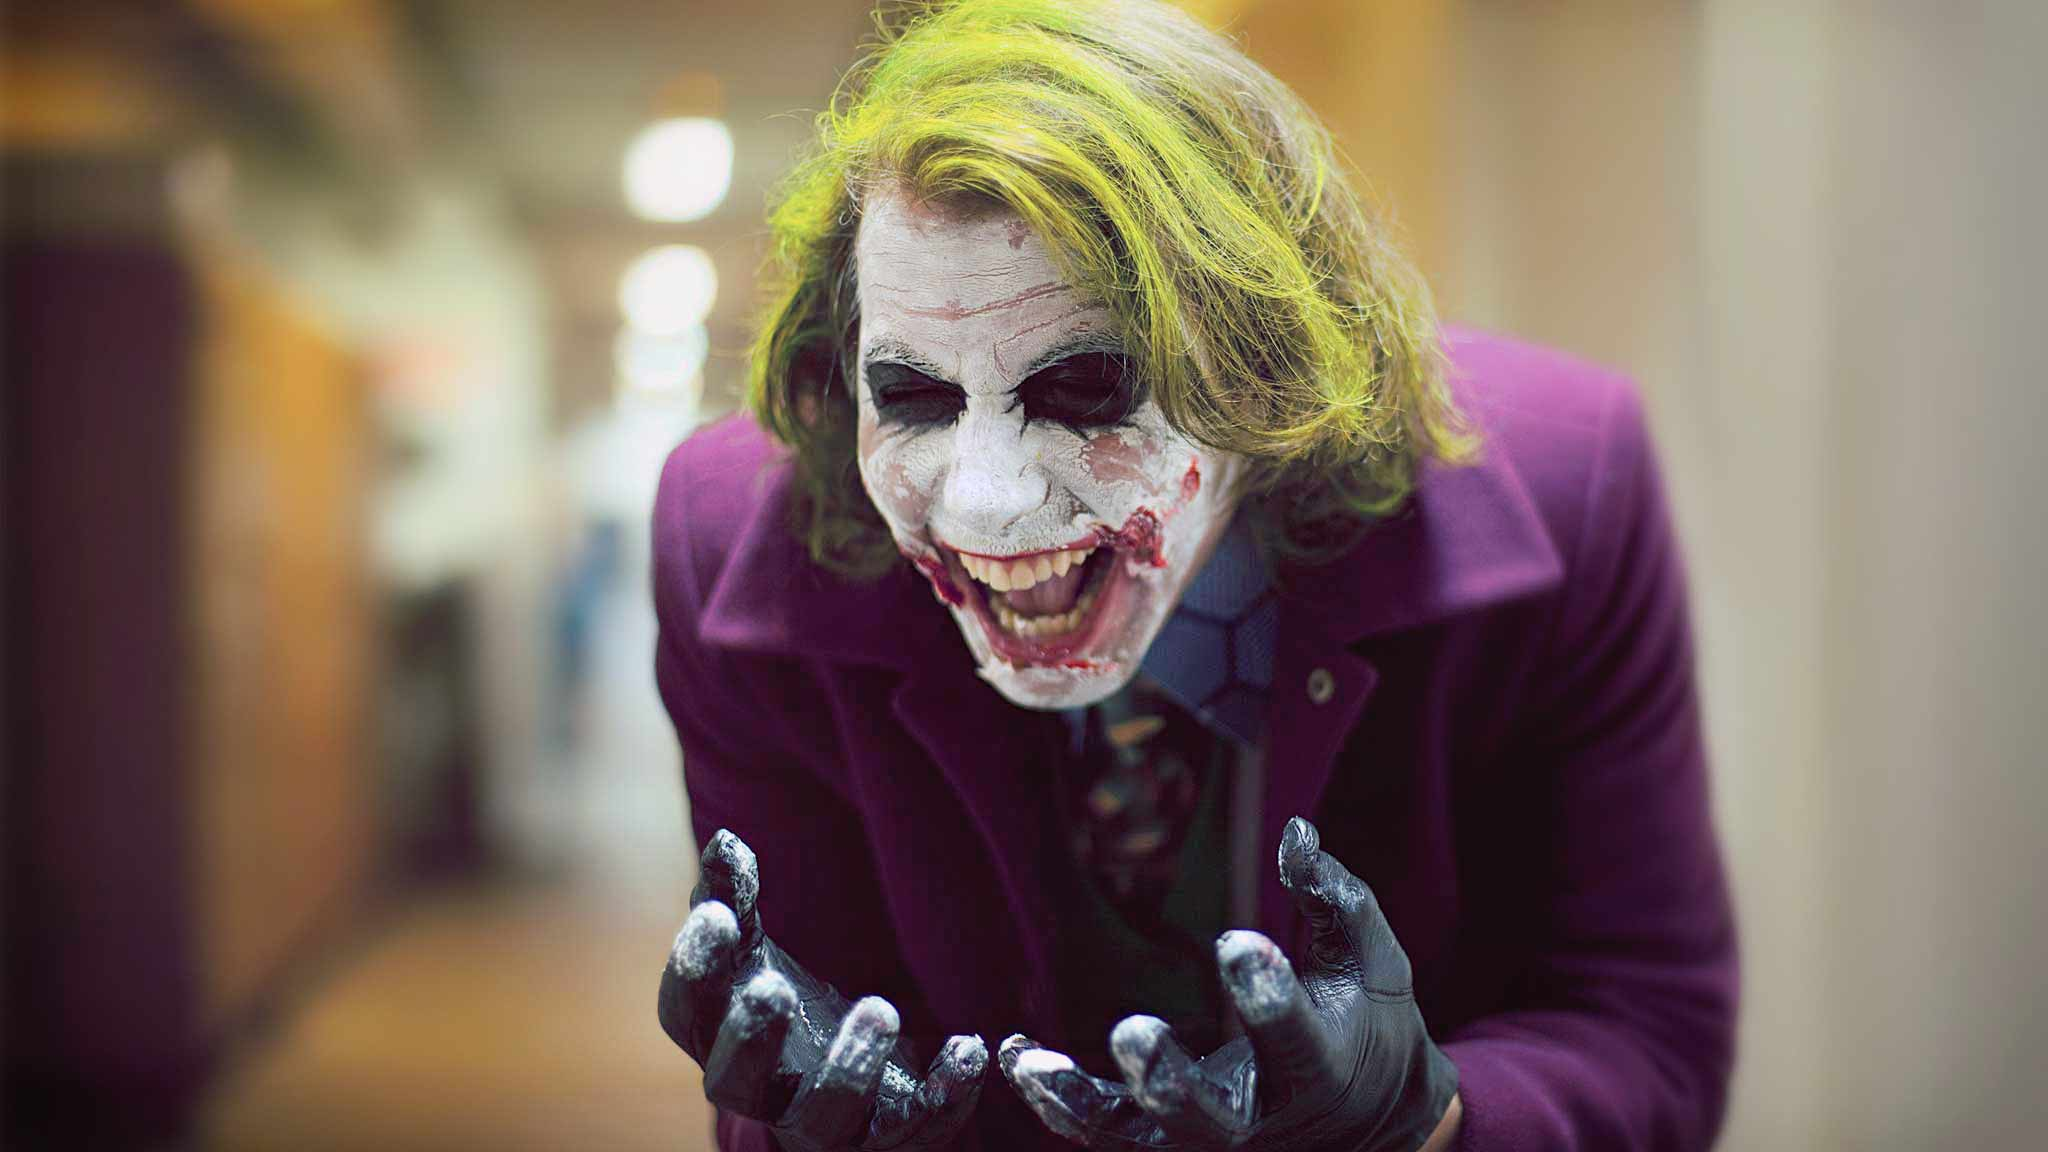 photographe portrait film tdk dark knight best joker cosplay